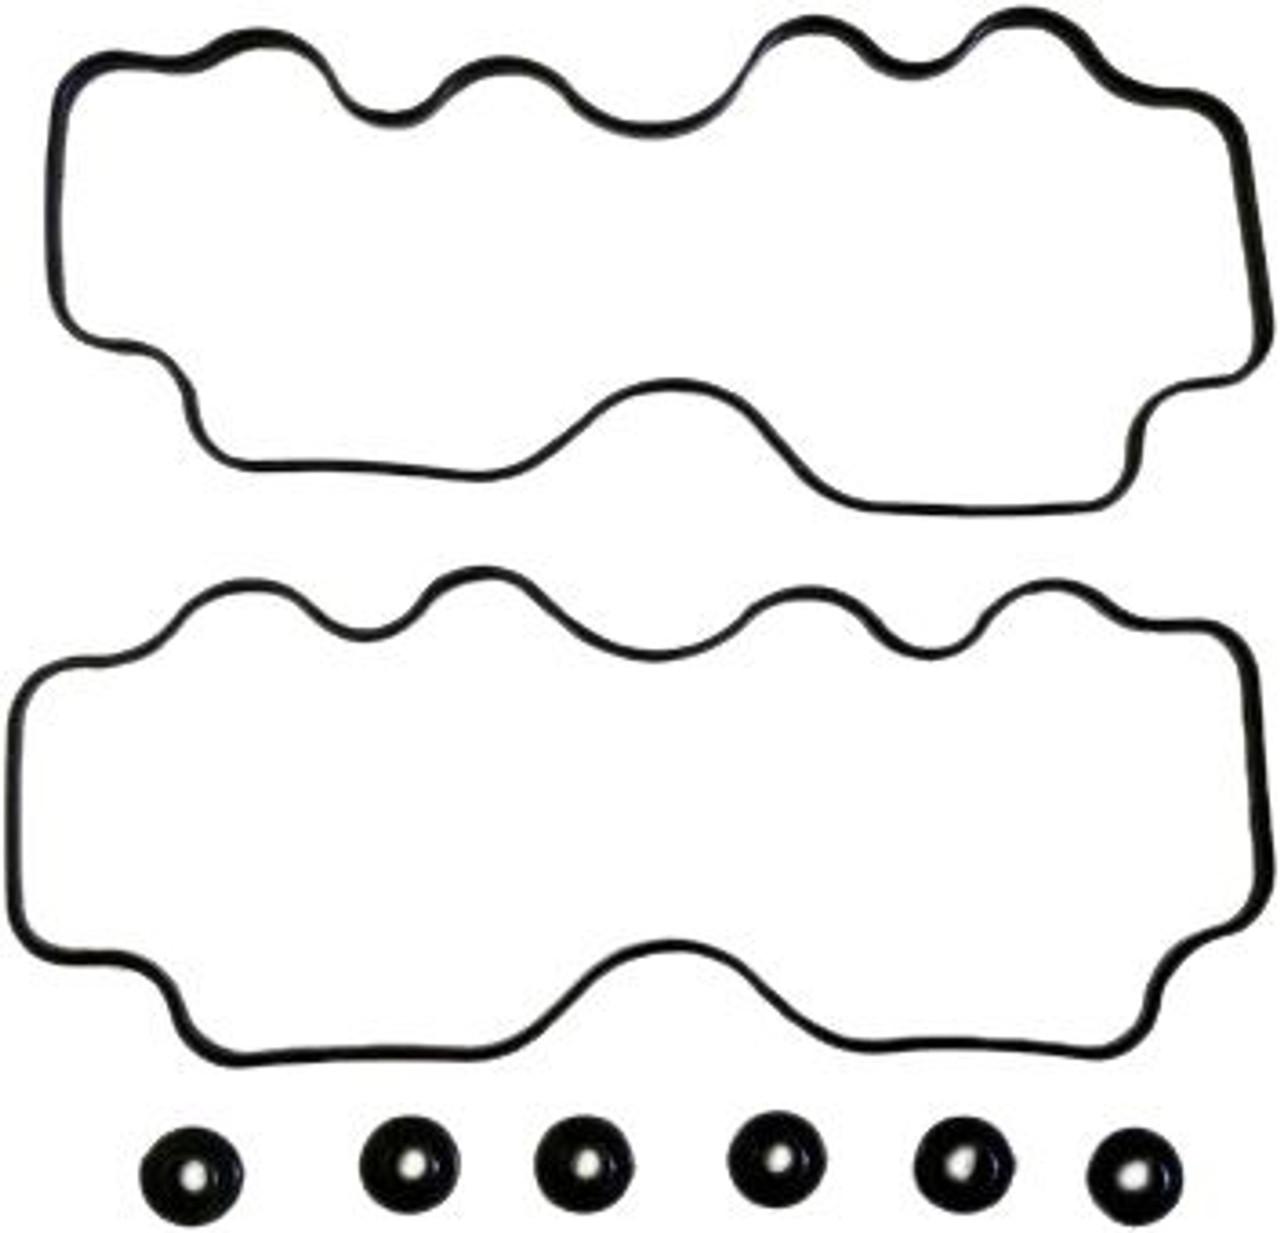 ford ranger fuse box diagram besides 2003 vw passat wiring diagram